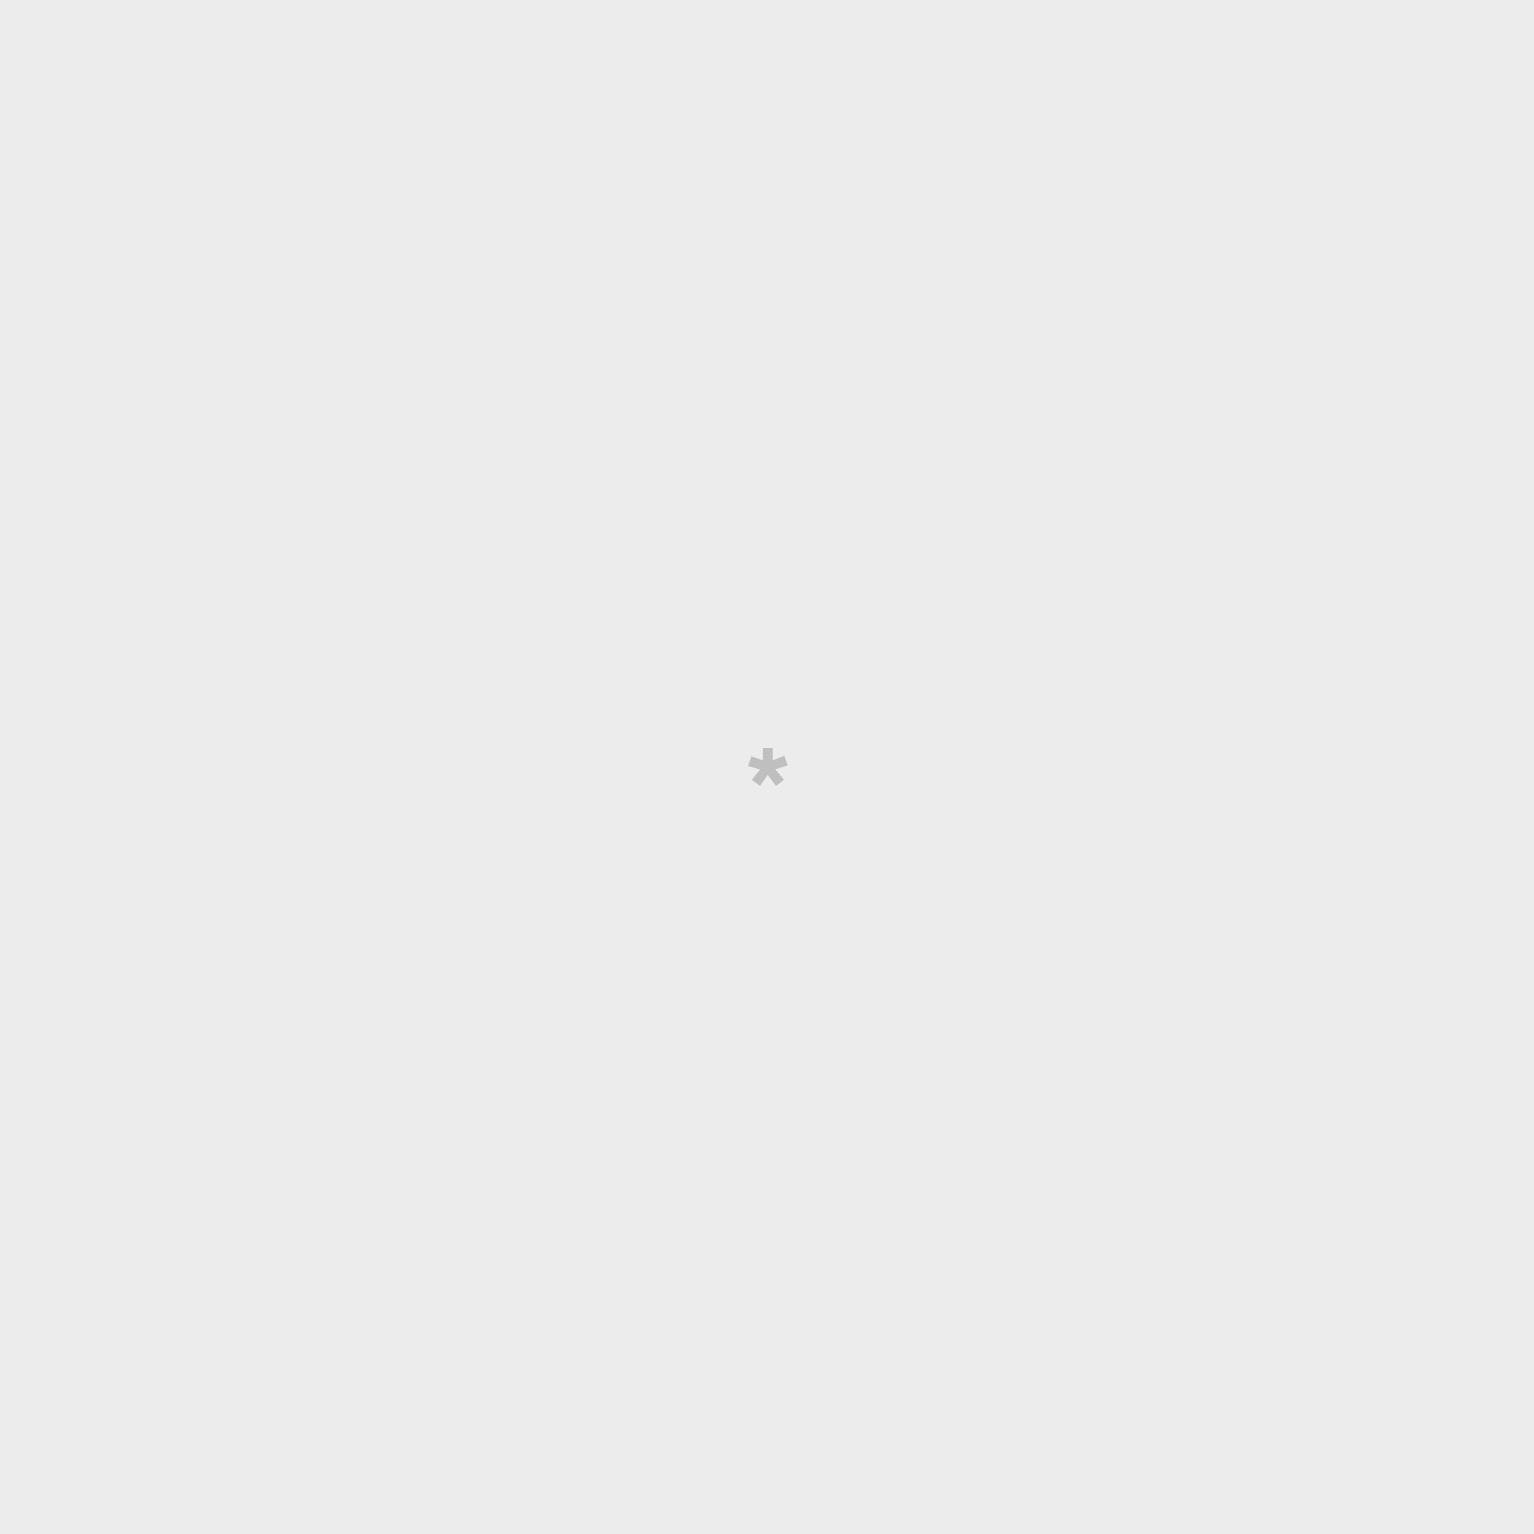 Sunglasses - Classy